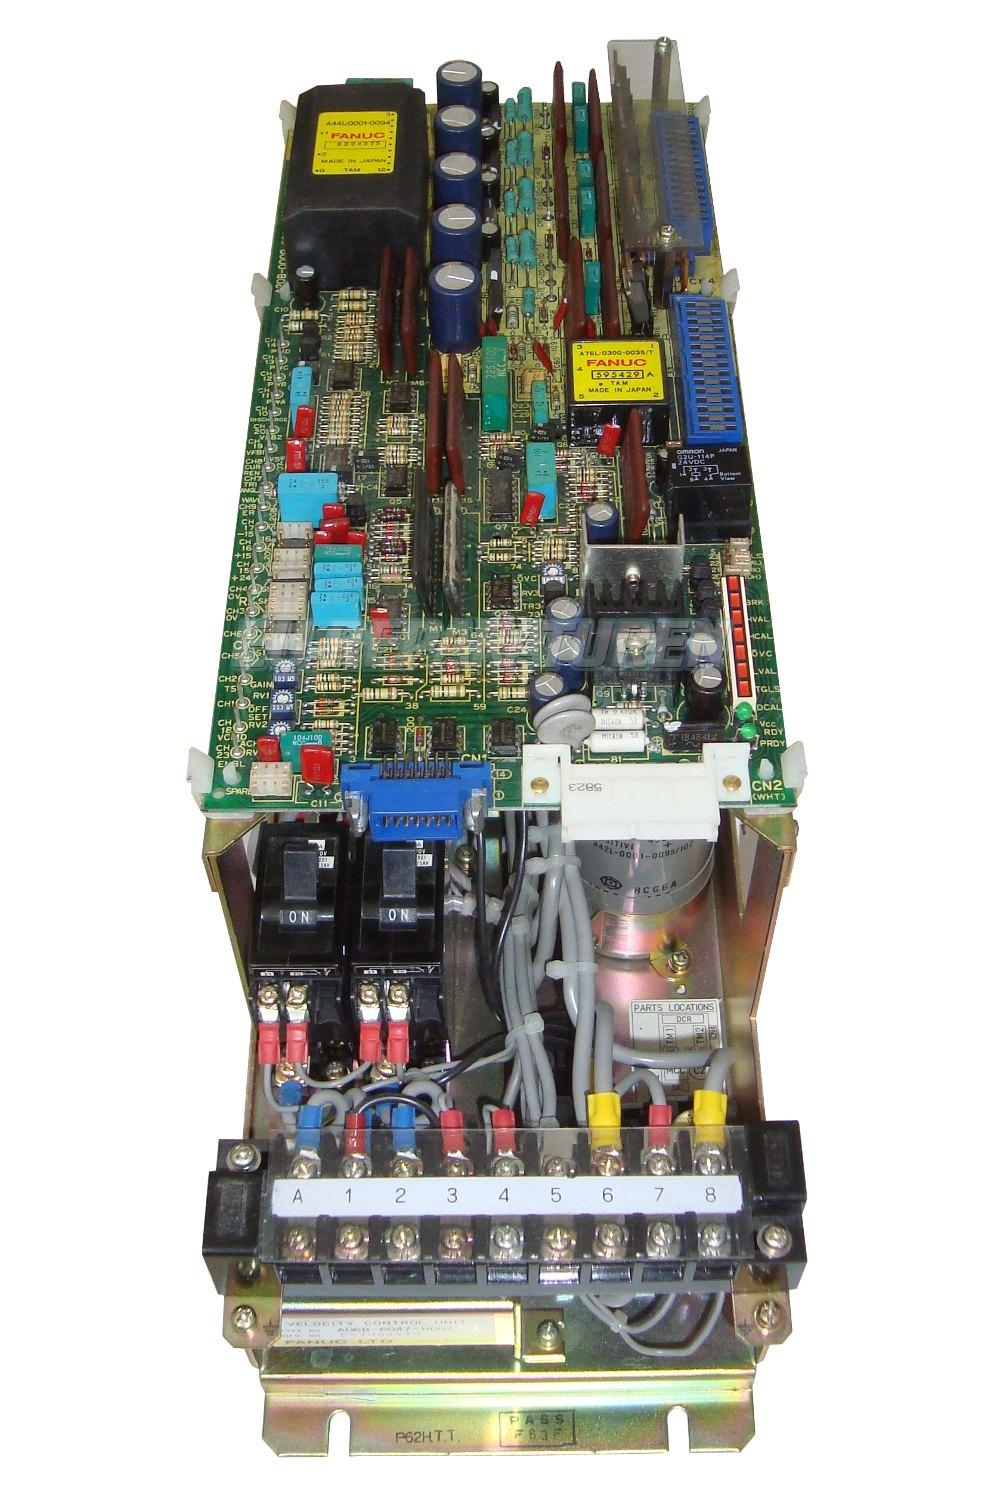 SHOP, Kaufen: FANUC A06B-6047-H002 DC-DRIVE